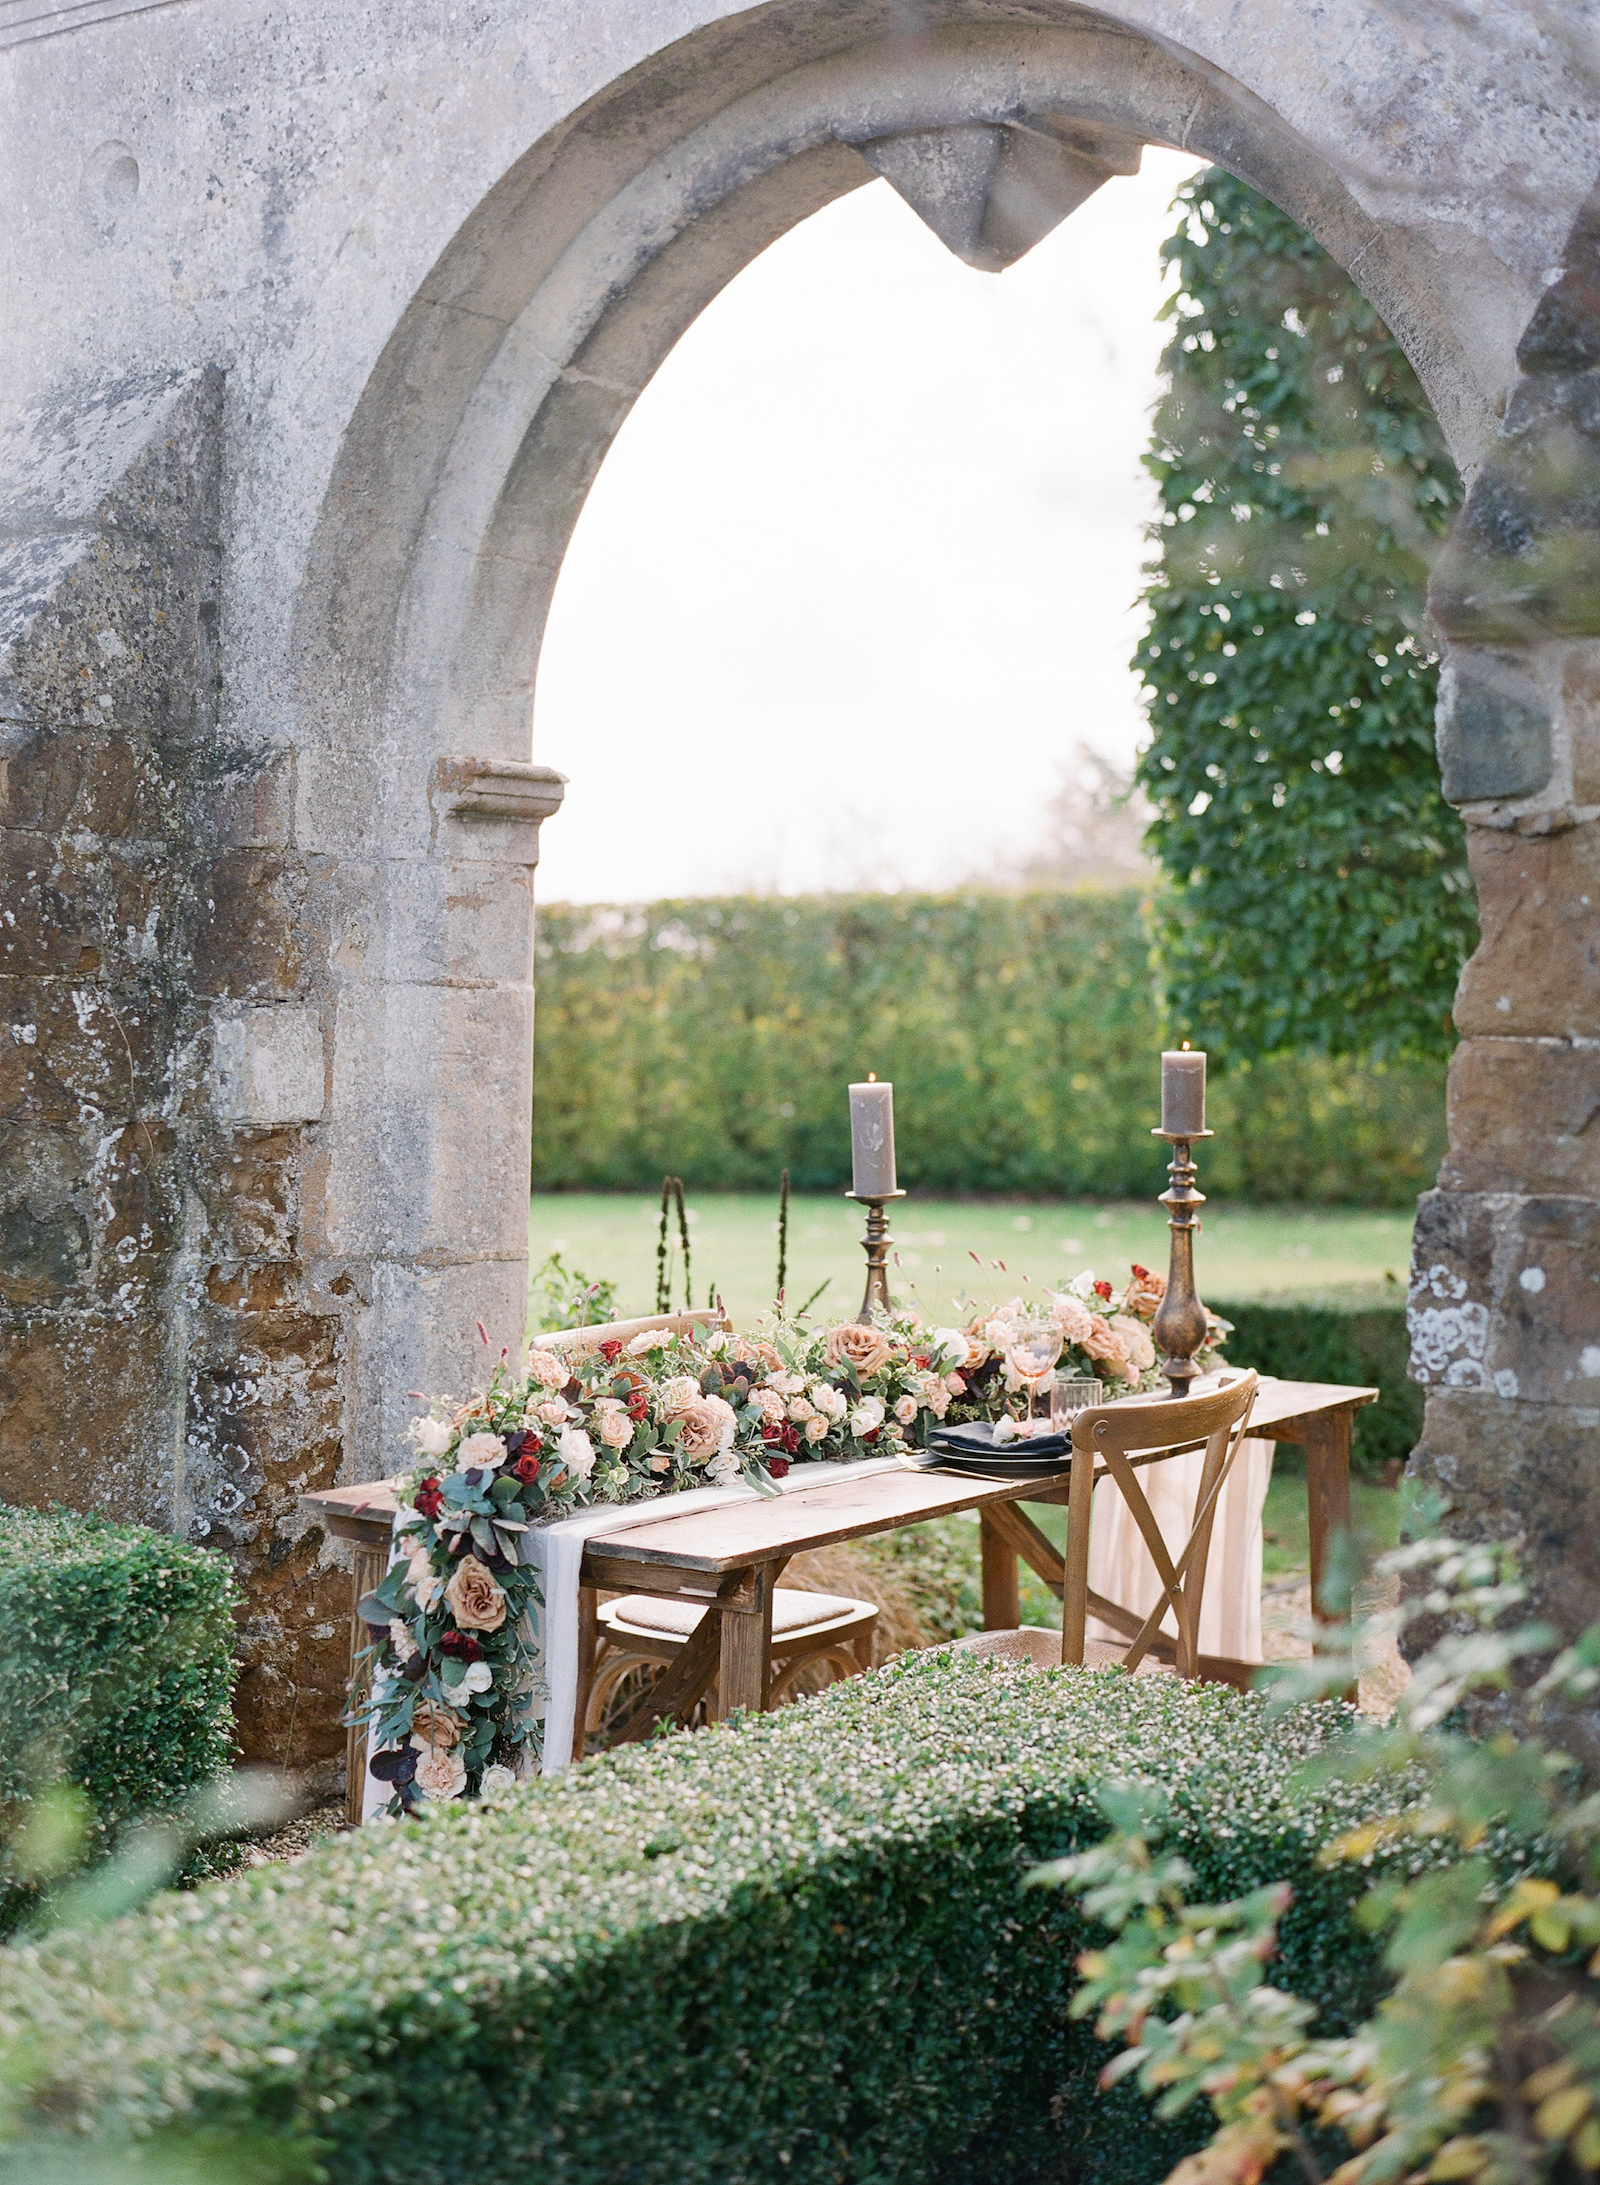 Luxury Wedding Planner UK, London & Europe | A Feminine & Refined Autumn Wedding Inspiration | English Manor Country Autumn Wedding Moody Romantic Warm Velvet Black Red and Peach Tones | Molly Carr Photography88.JPG